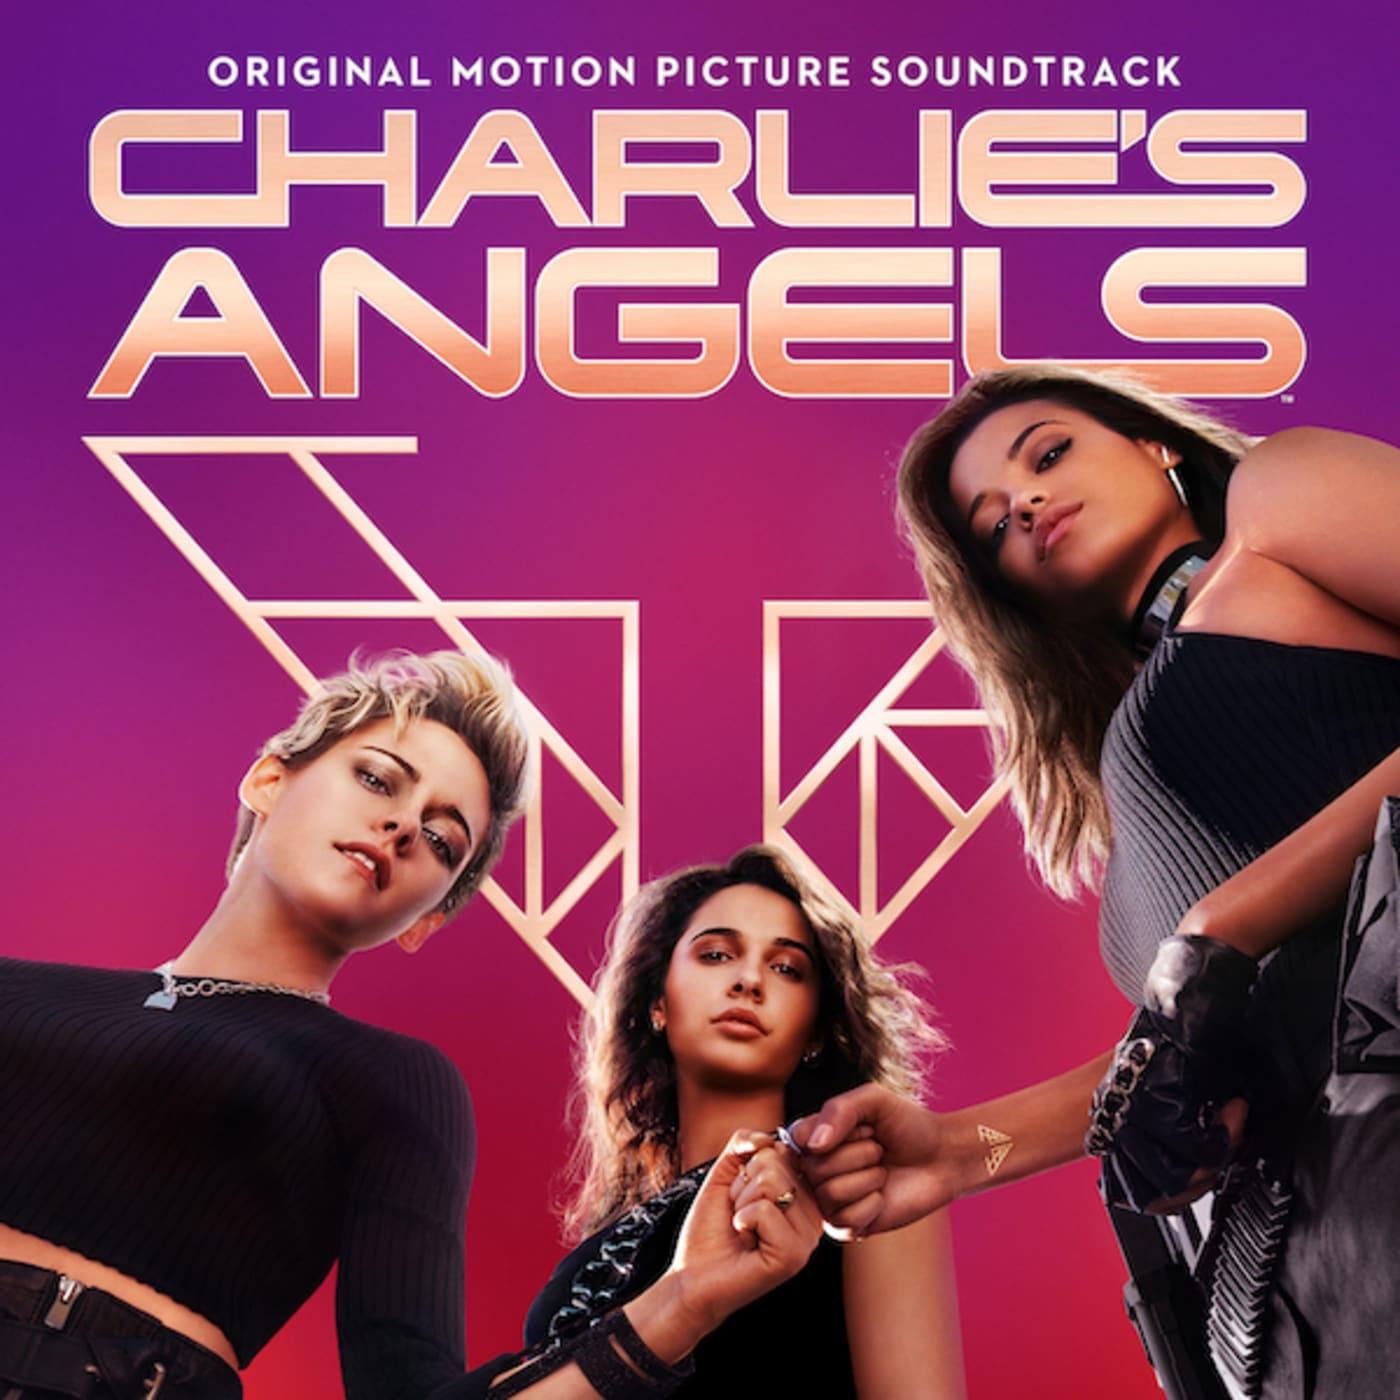 charlies angels soundtrack